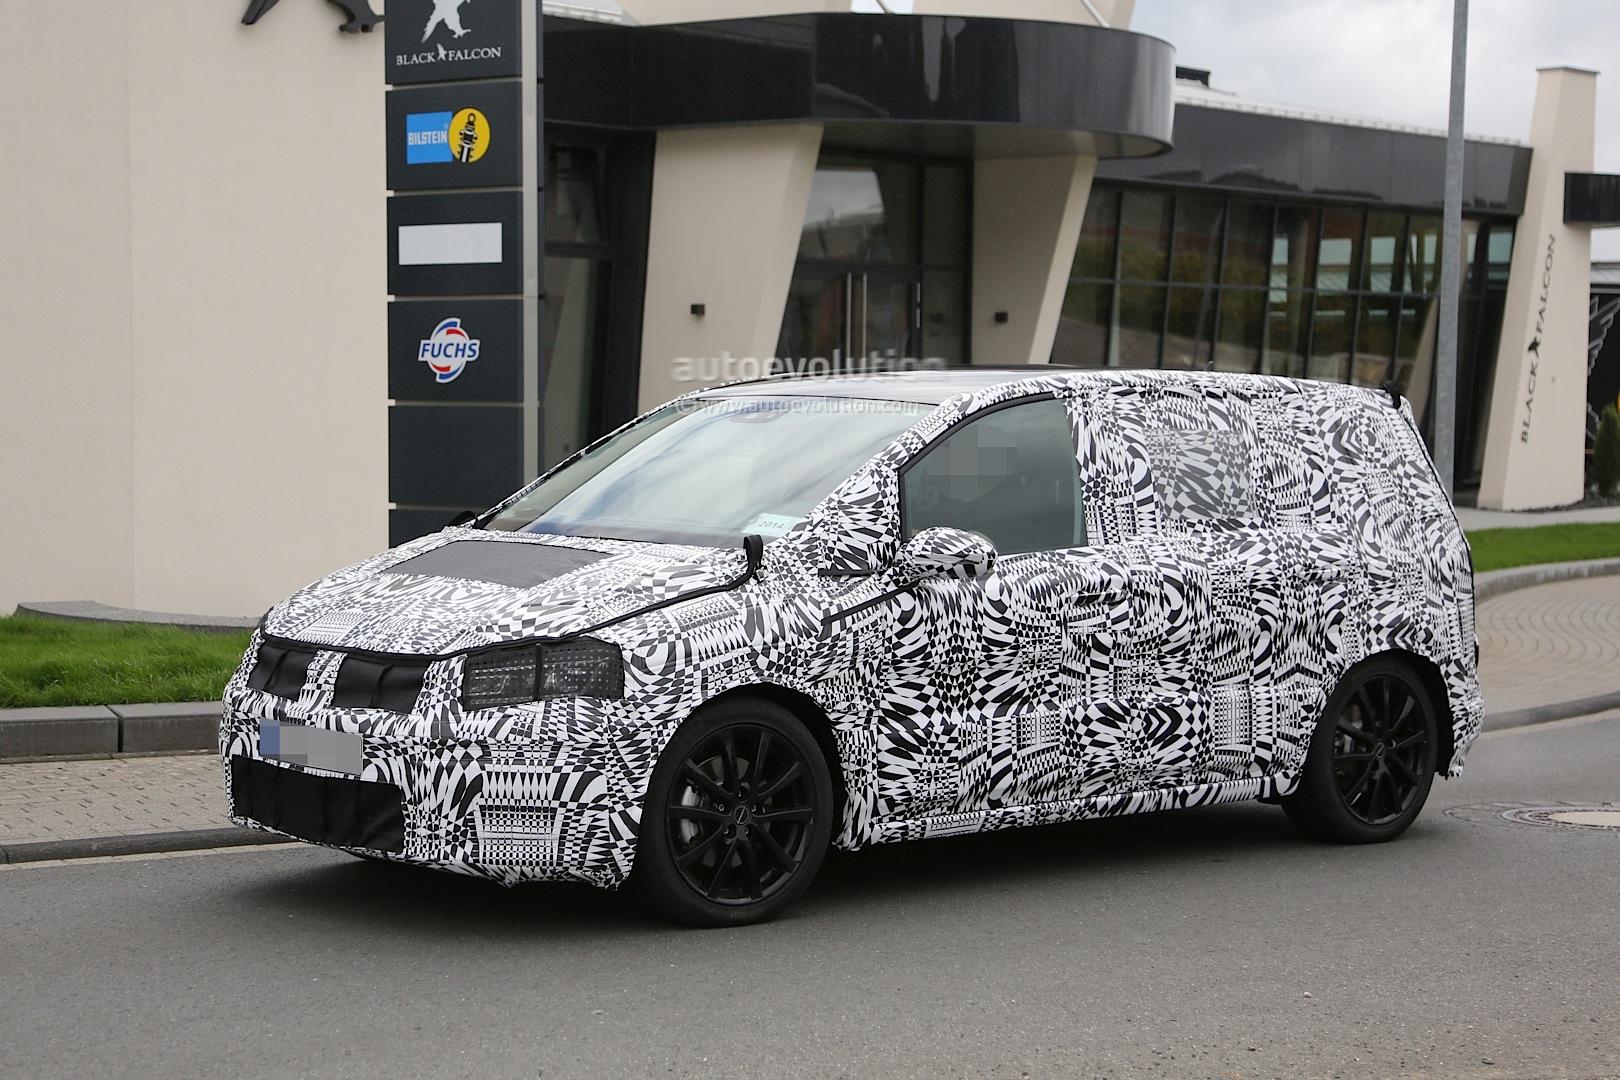 2015 - [Volkswagen] Touran - Page 3 2015-volkswagen-touran-spied-with-led-headlights_3